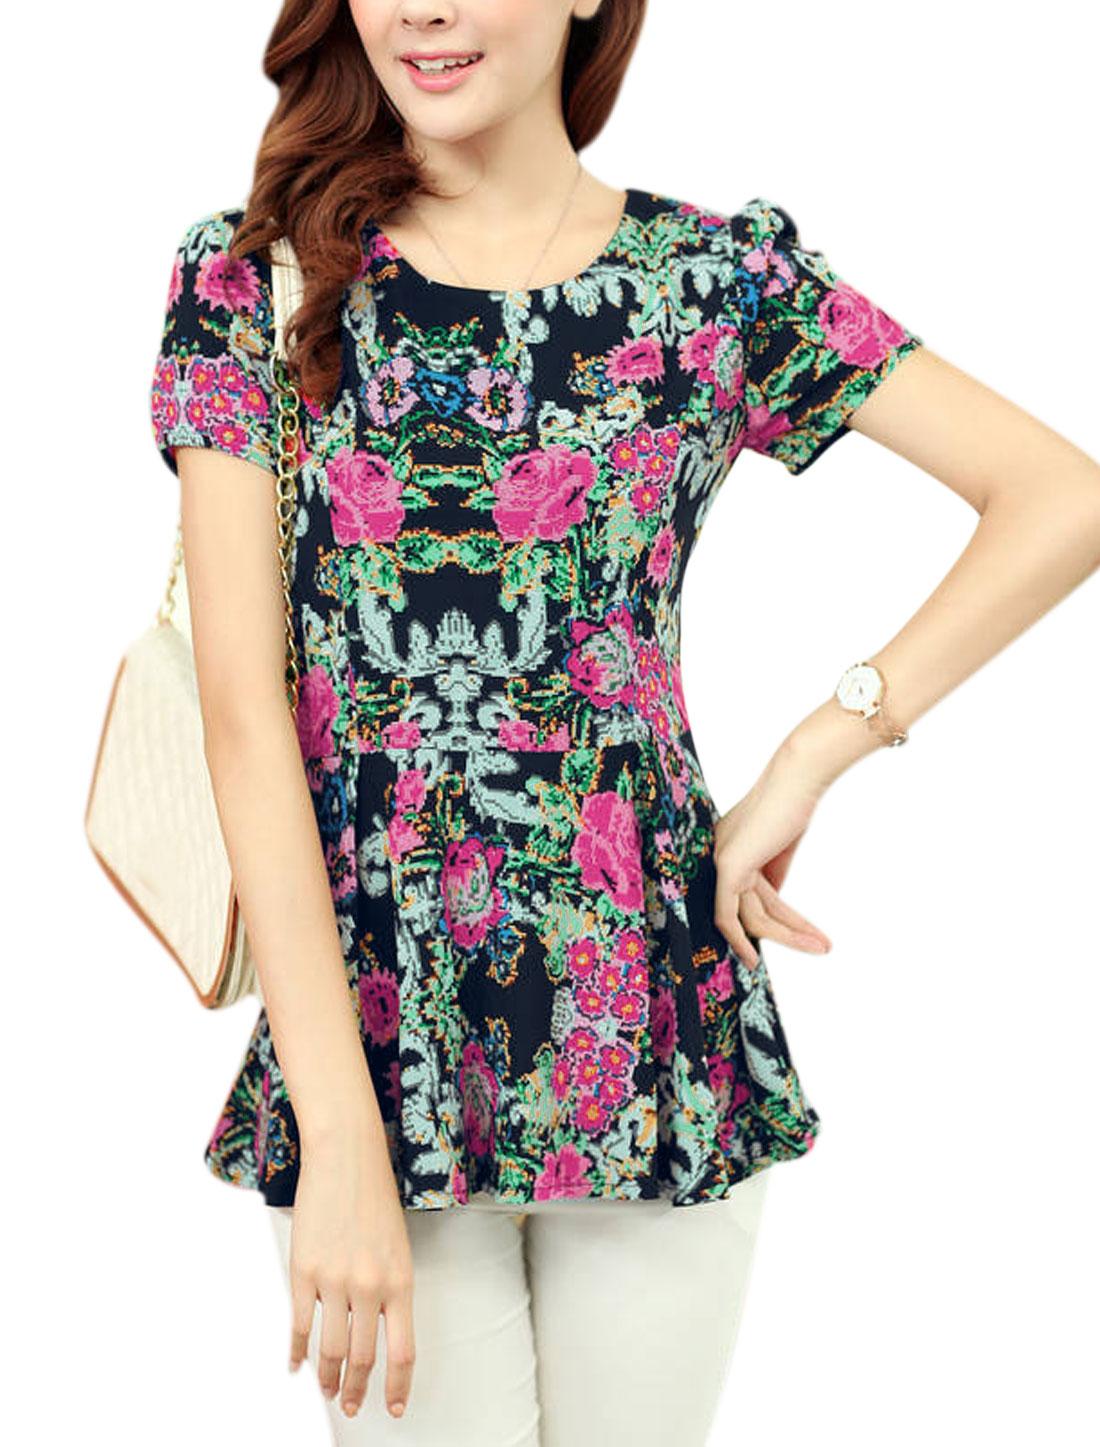 Women's Round Neck Short Sleeve Floral Print Chiffon Peplum Blouse Black M